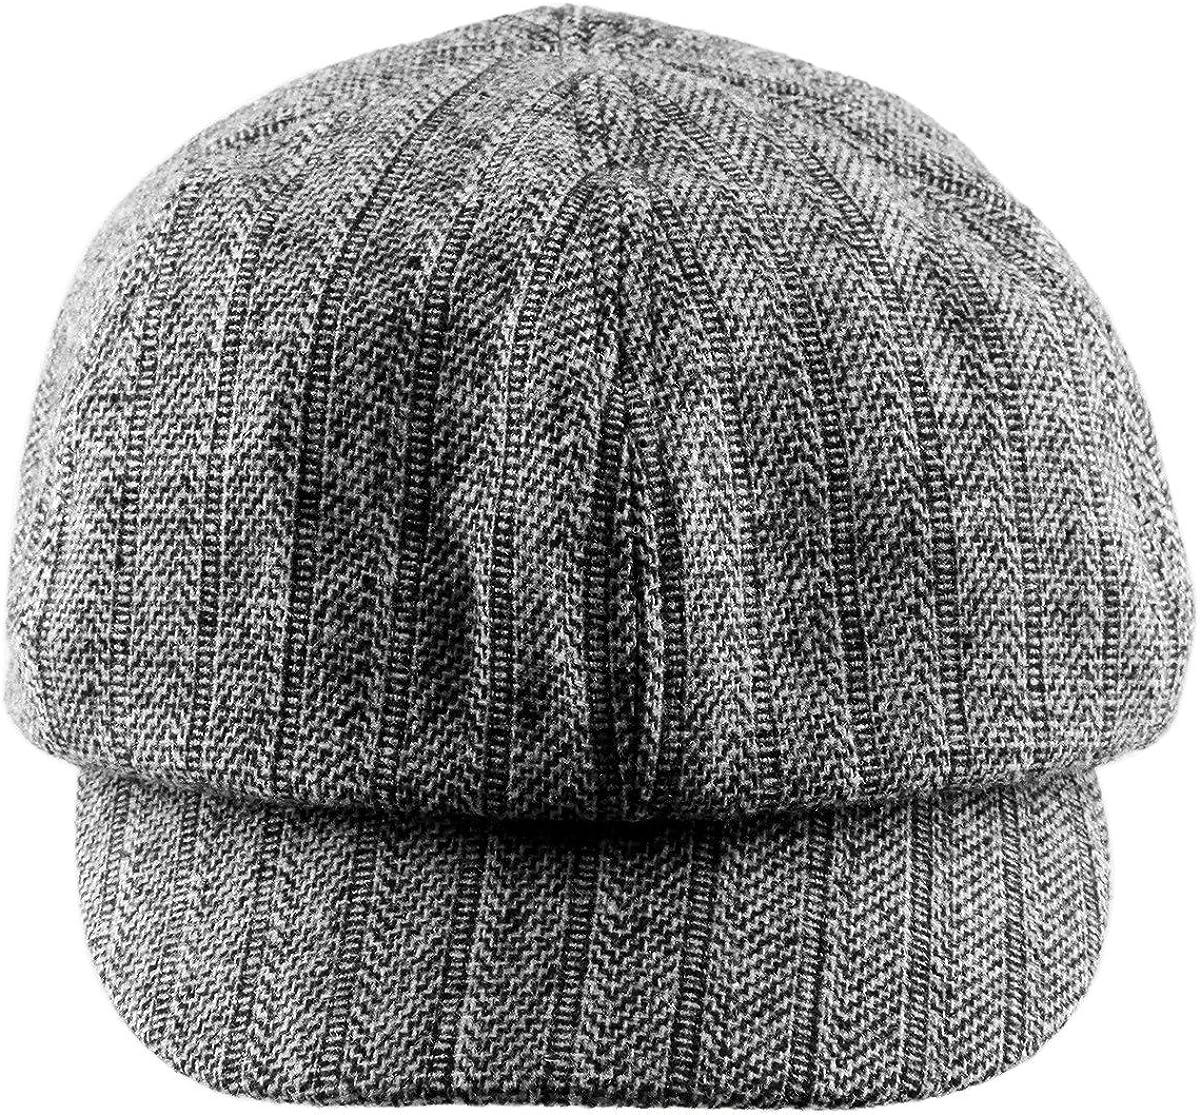 Lot of 2 Men/'s Corduroy Newsboy Cabbie Hat Ivy Gatsby Brown /& Black S//M NEW L#5